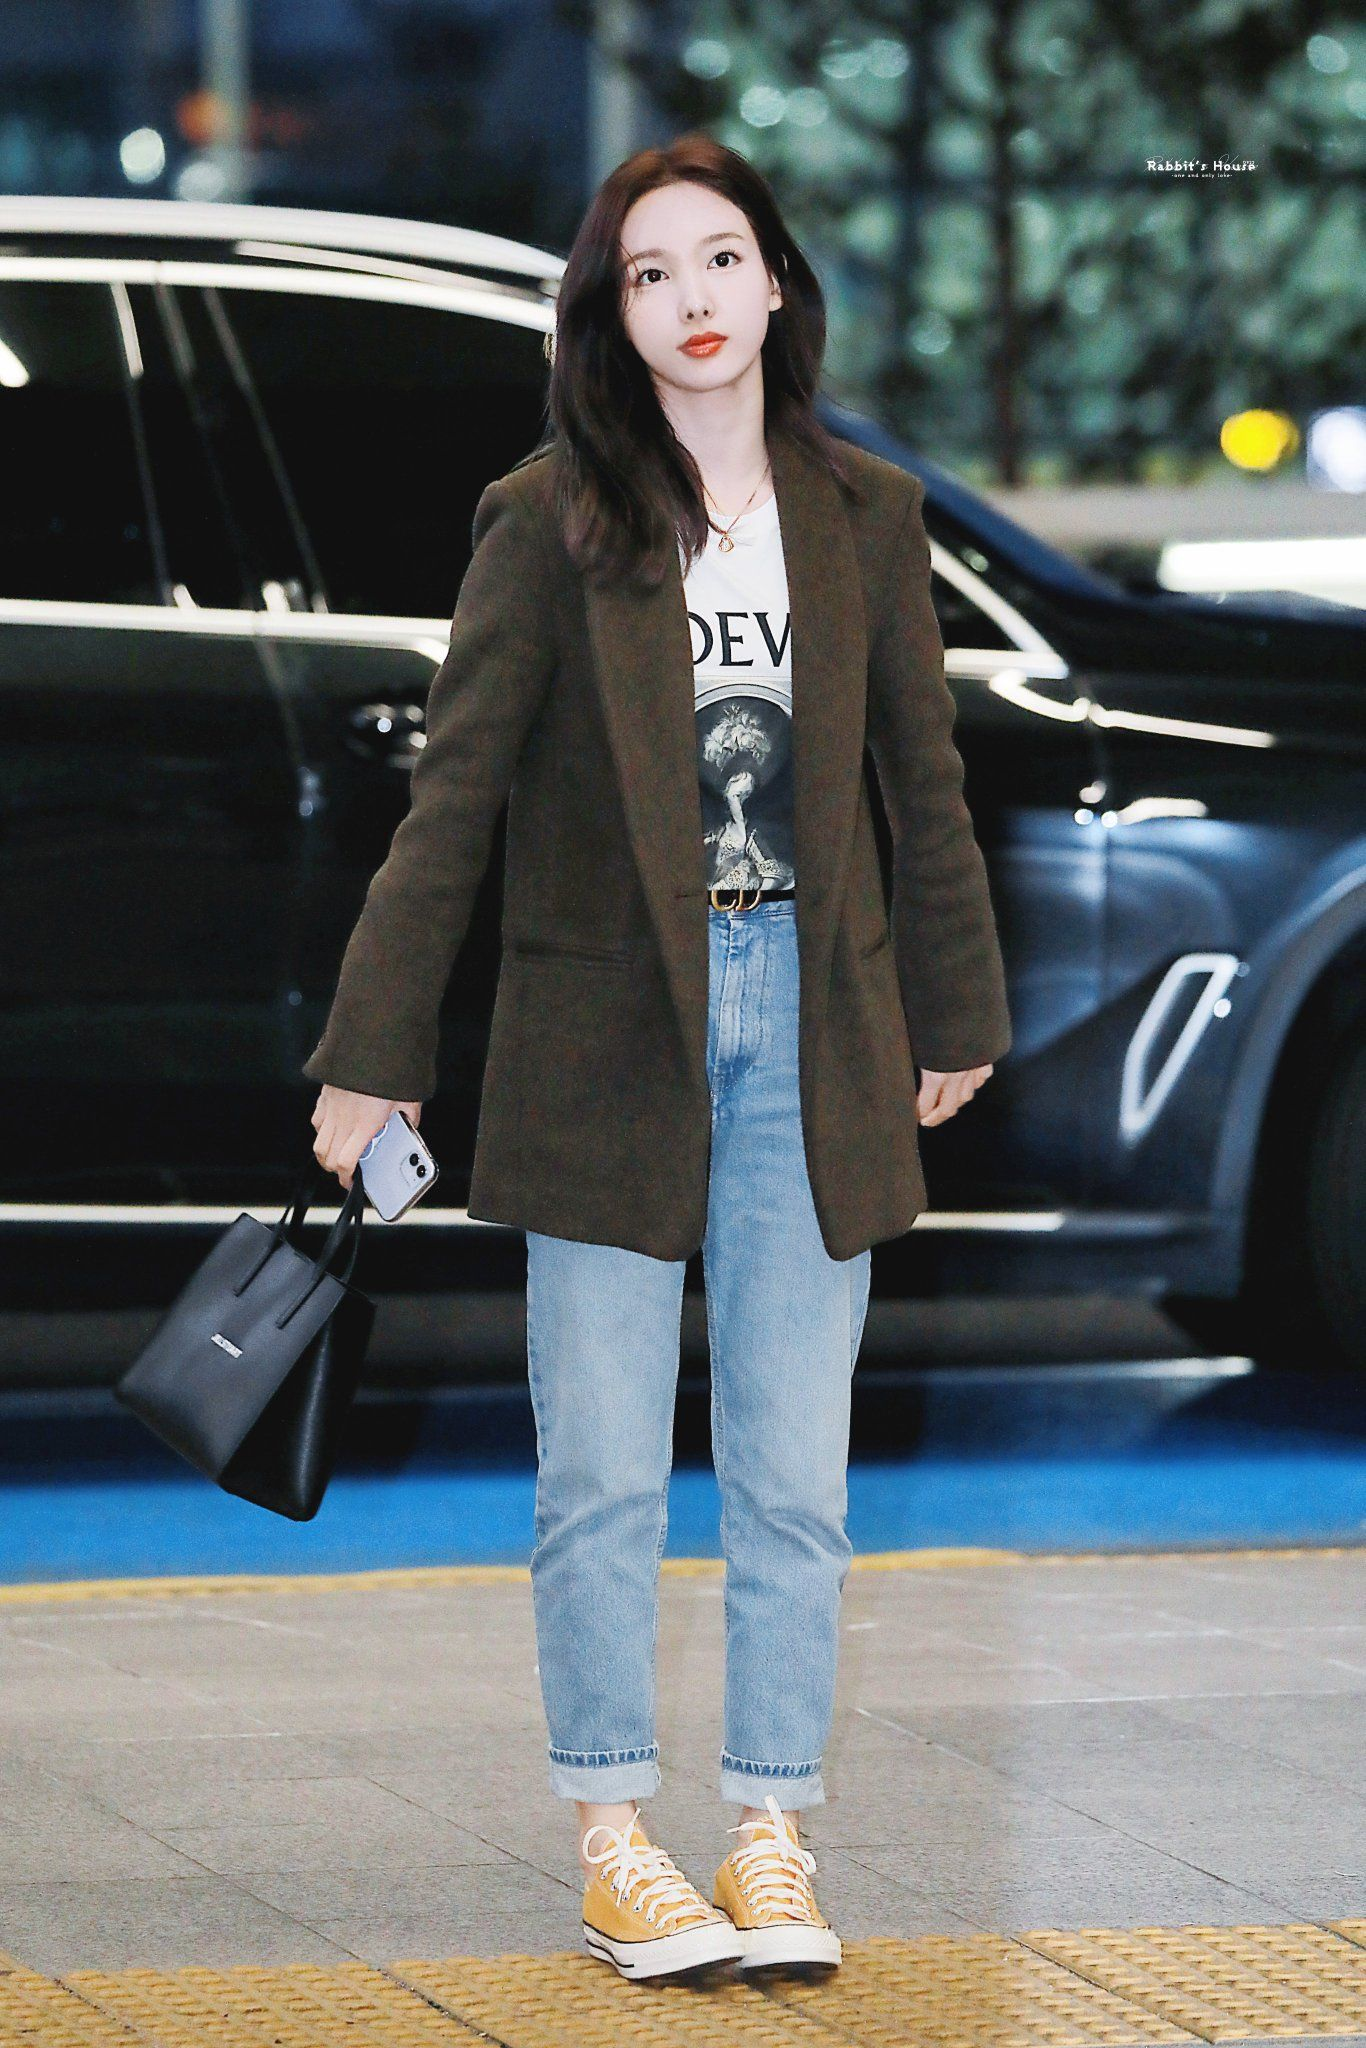 Rabbit S House On Twitter Korean Airport Fashion Airport Fashion Kpop Kpop Fashion